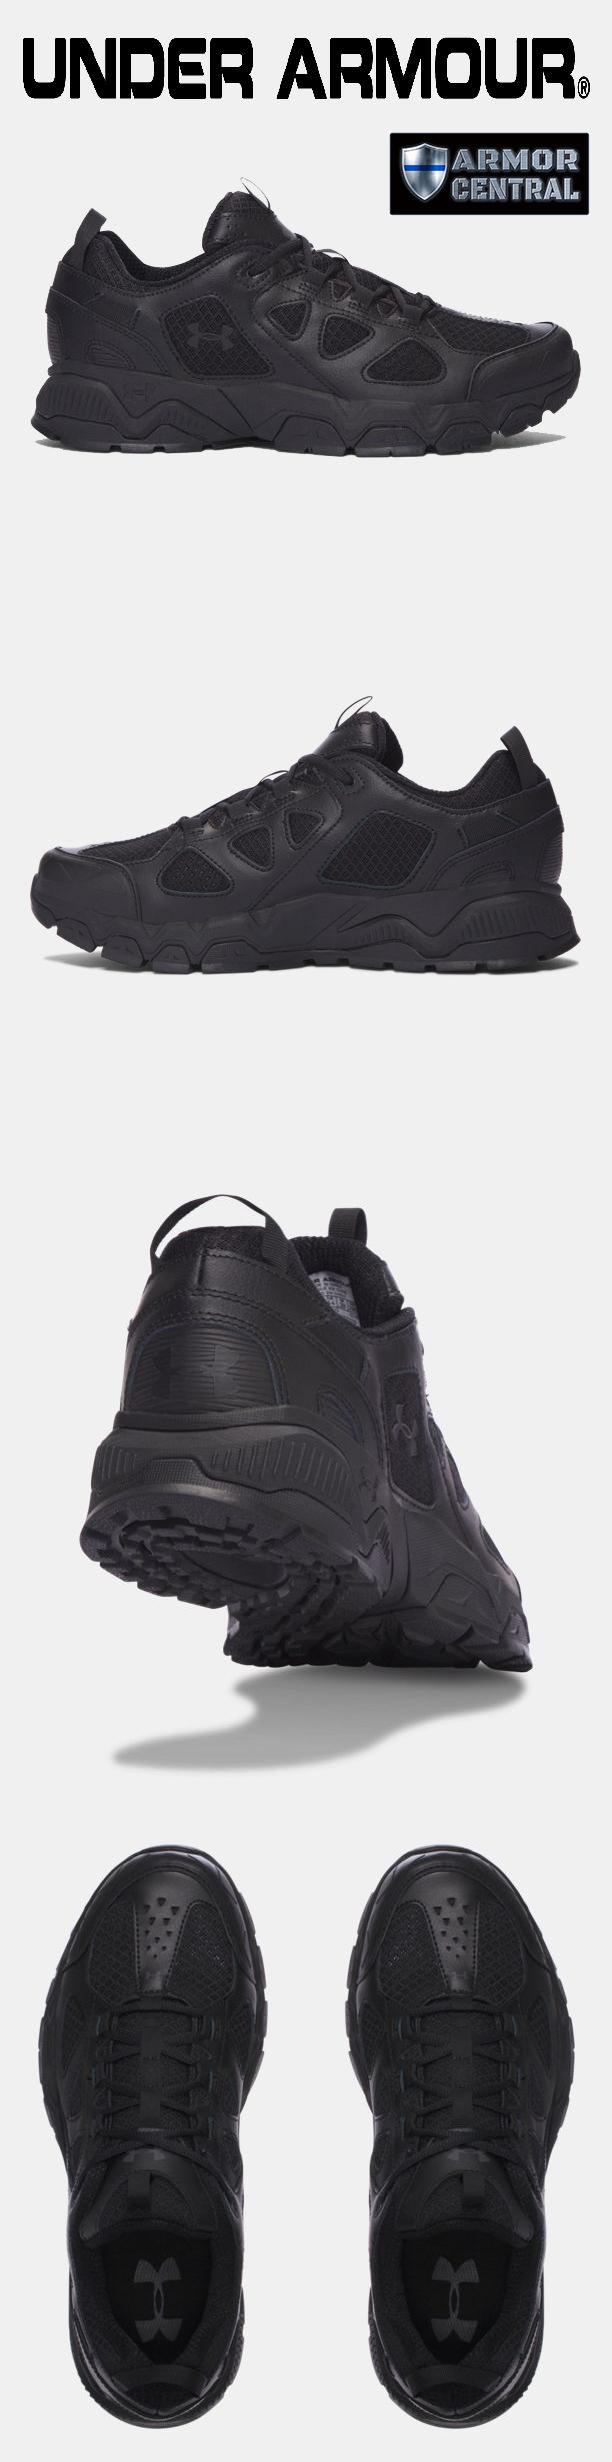 Tactical Footwear 177897 New Under Armour Mens Ua Black Celana Taktikal Panjang Mirage 30 Shoes All